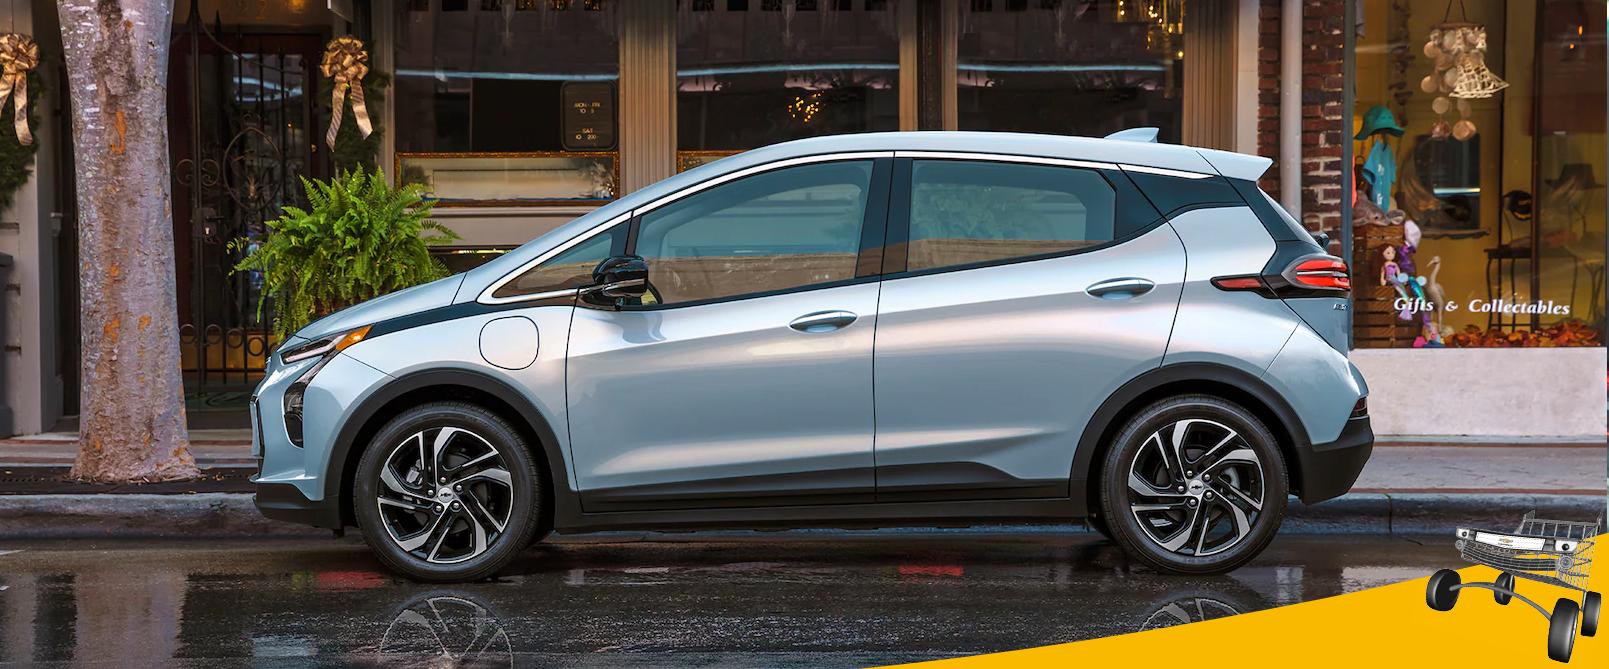 2022 Chevrolet Bolt EV Safety Features